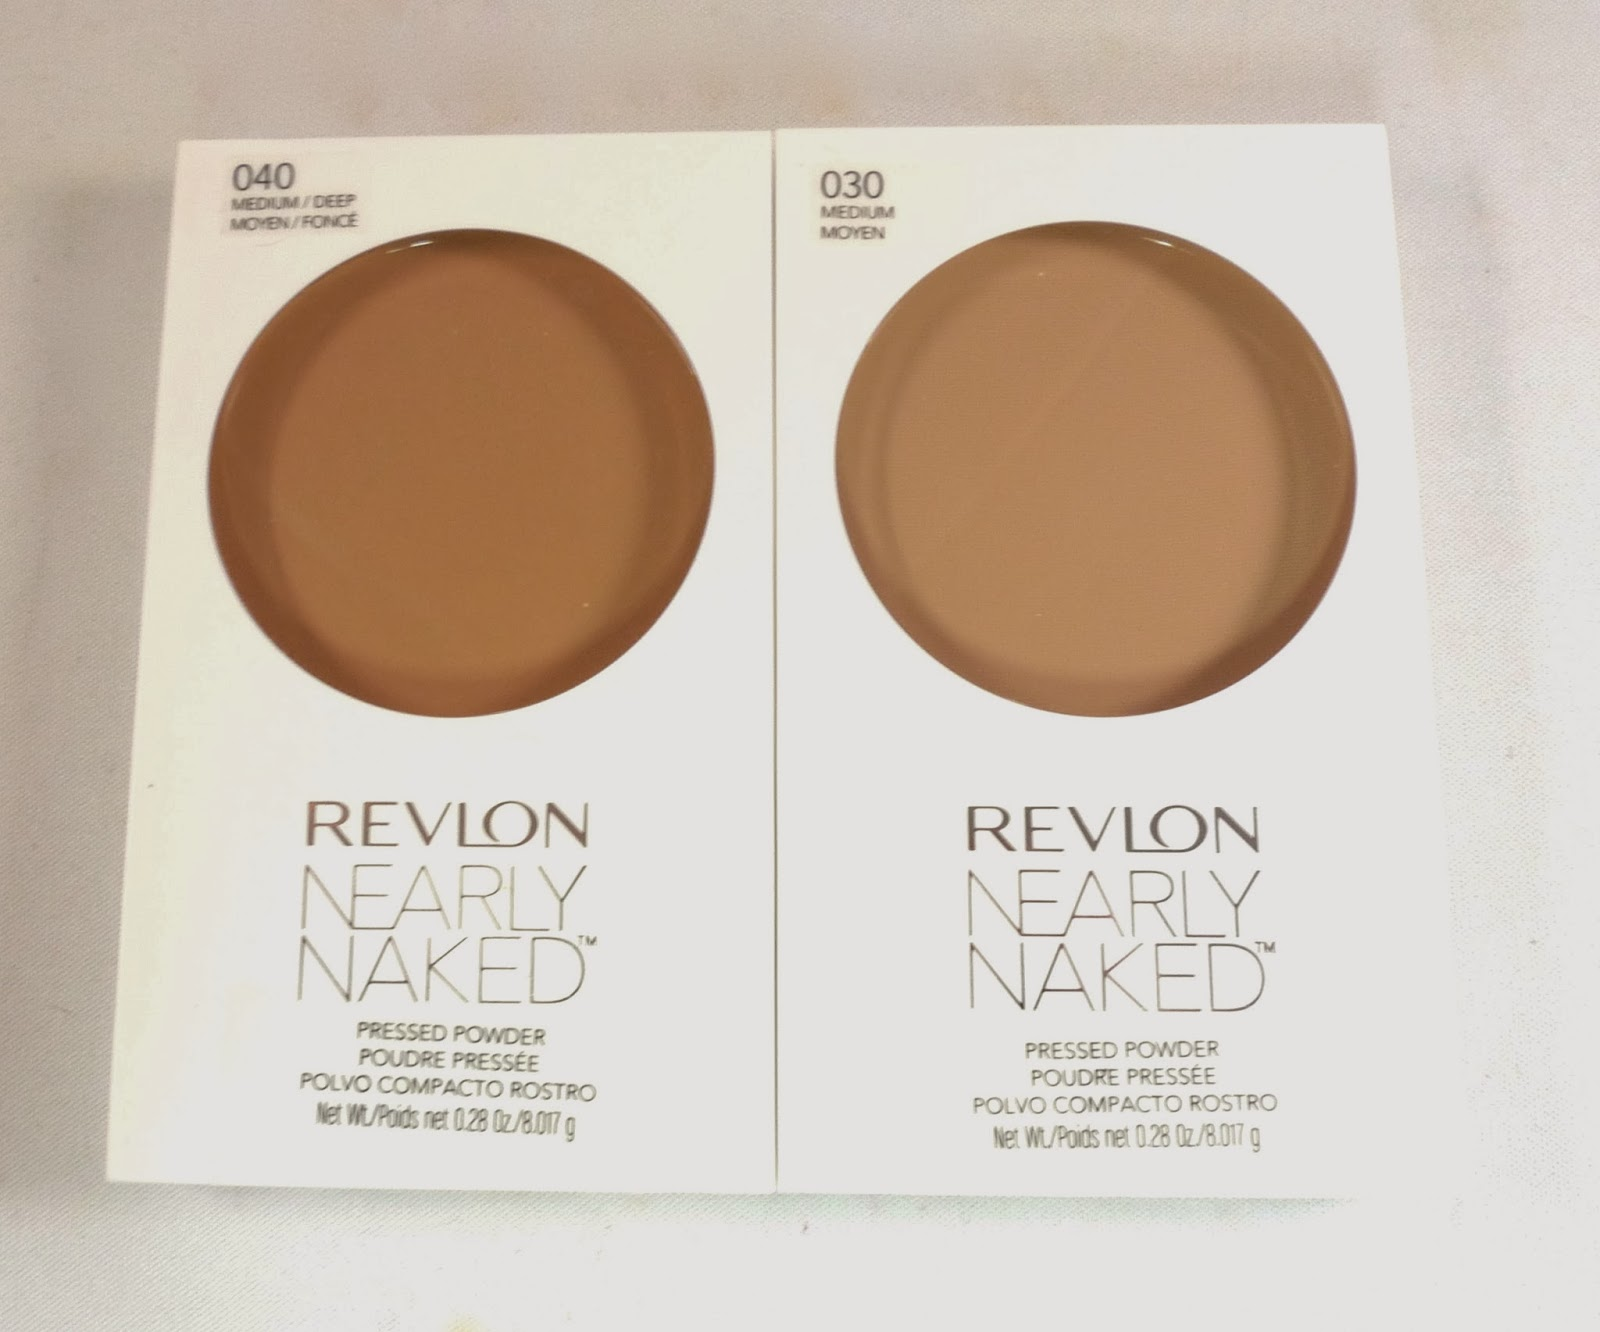 Revlon Nearly Naked Pressed Powder reviews, photos